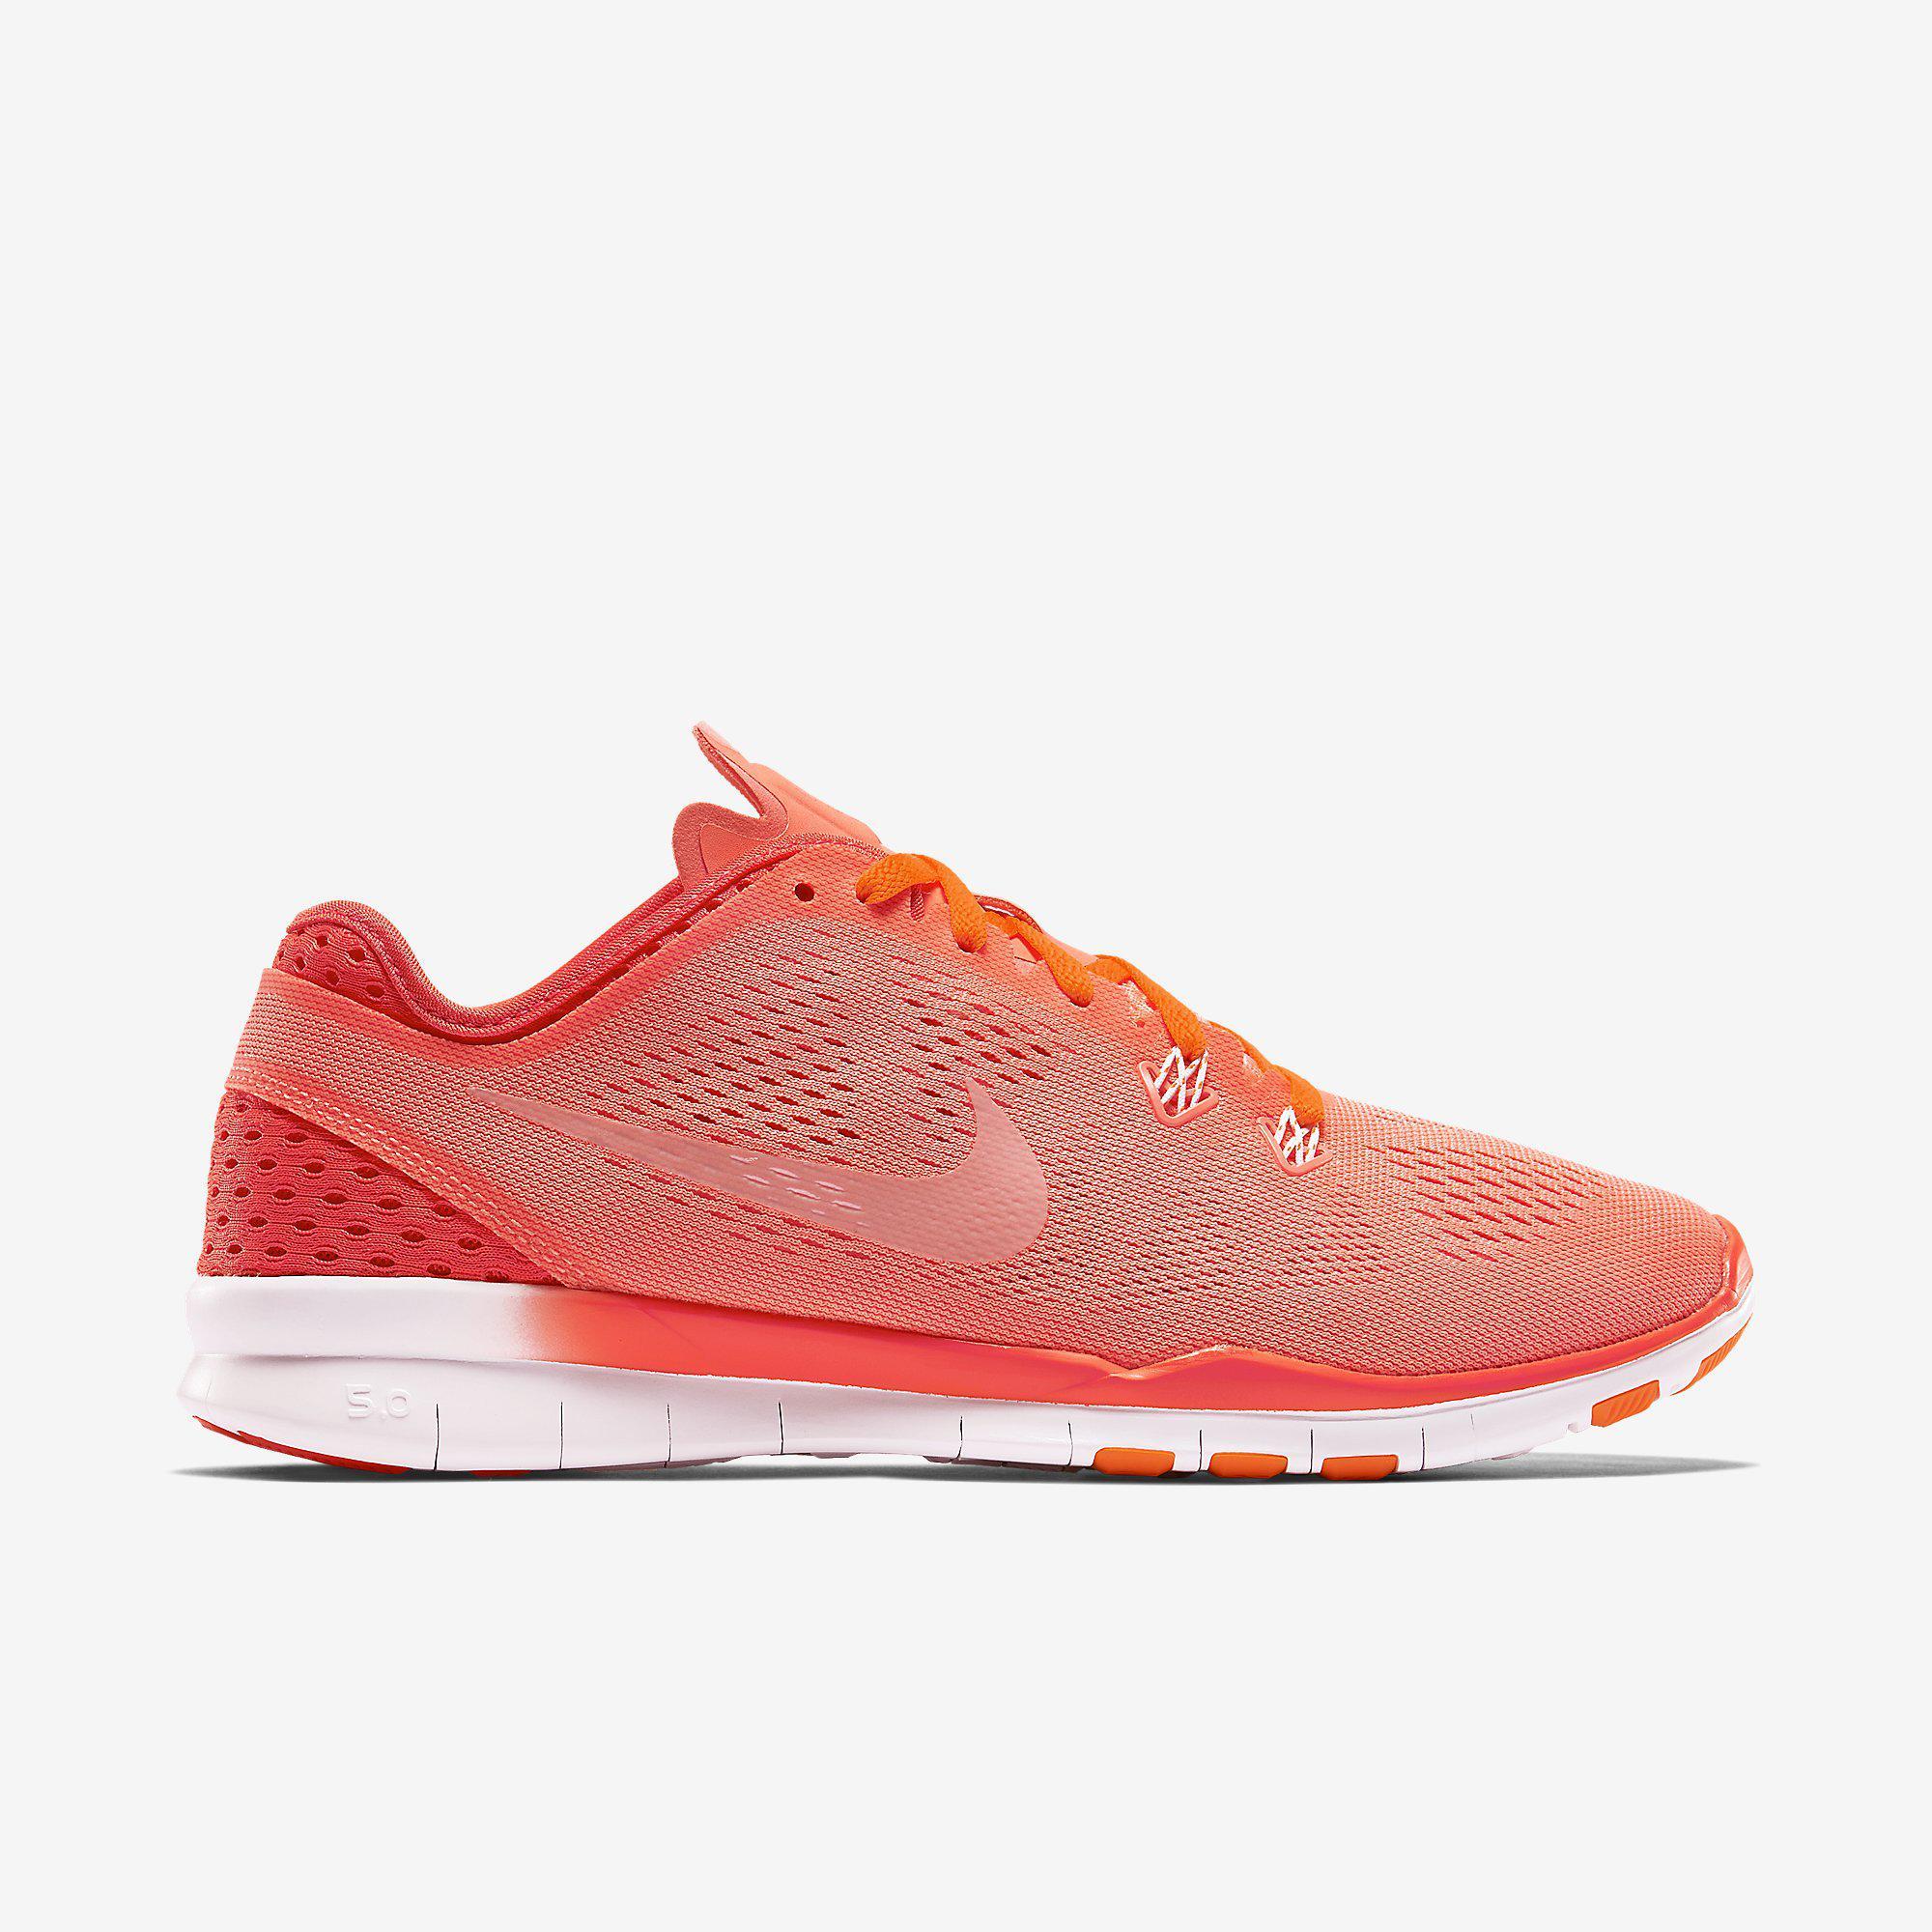 6c47ad86818 Nike Womens Free 5.0 TR Breathe Training Shoes - Lava Glow Bright Crimson -  Tennisnuts.com